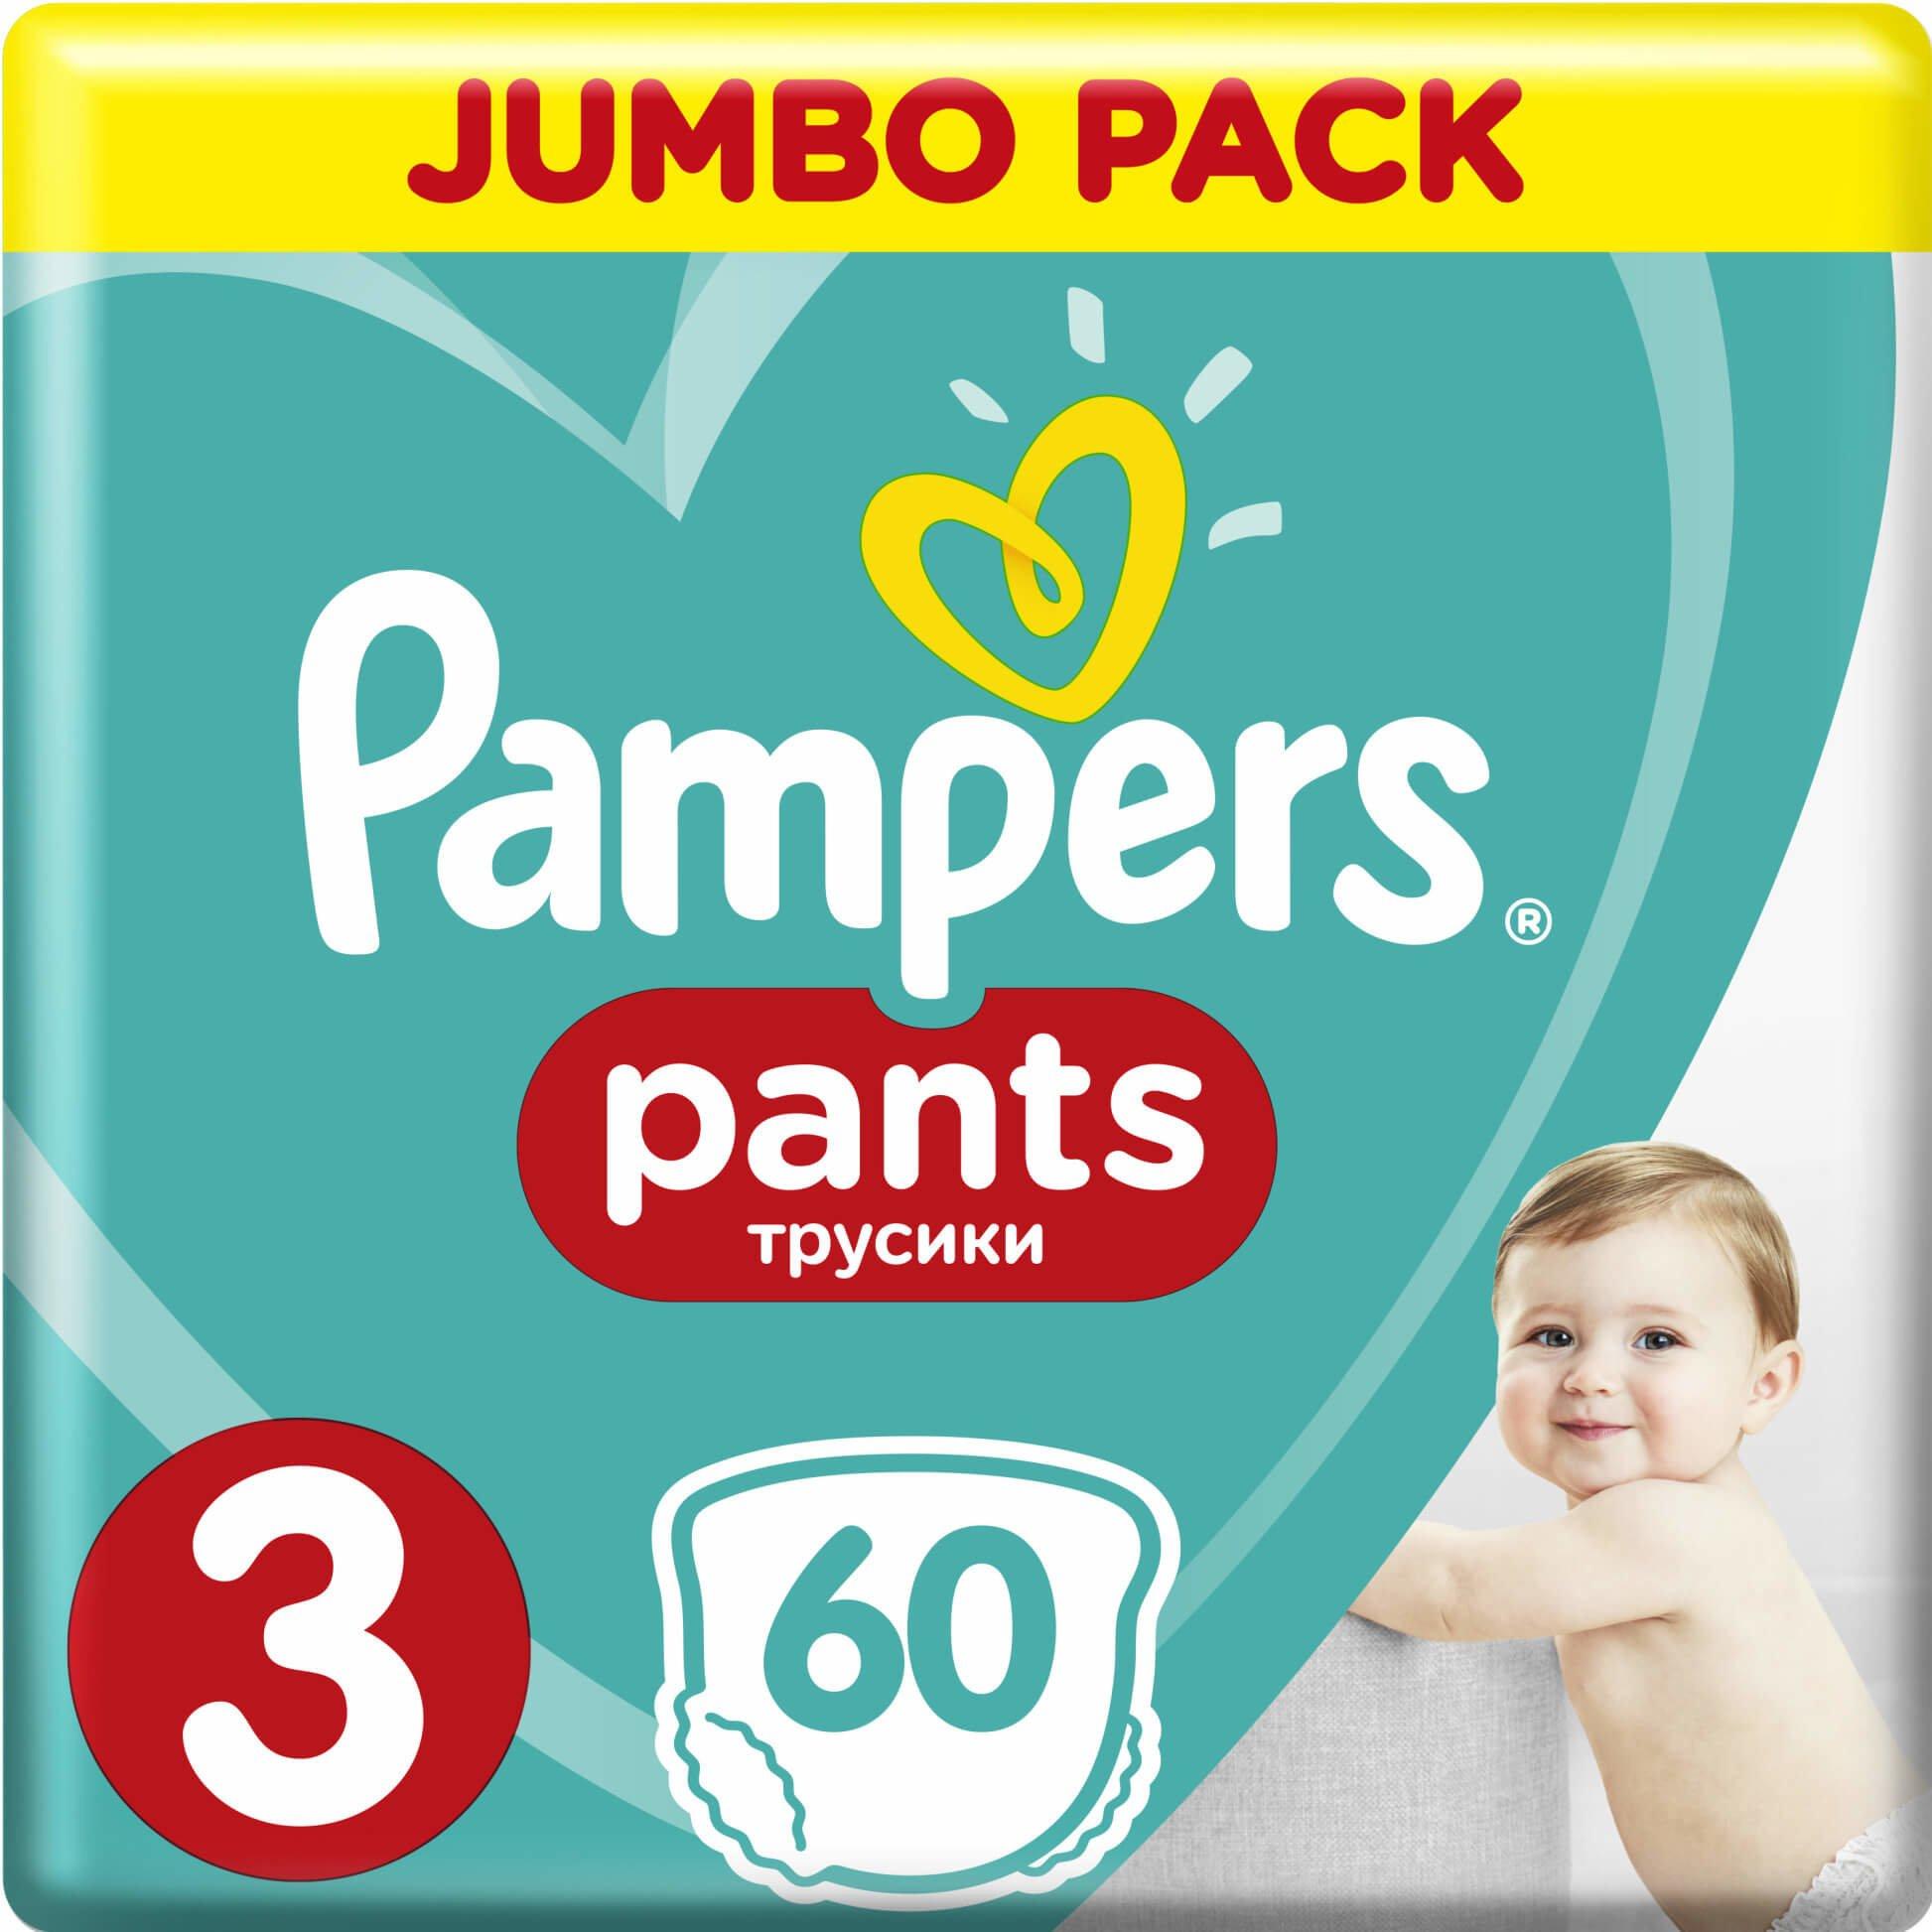 Pampers Pants Jumbo Pack No3 (6-11kg) 60 πάνες μητέρα παιδί   περιποίηση για το μωρό   πάνες για το μωρό